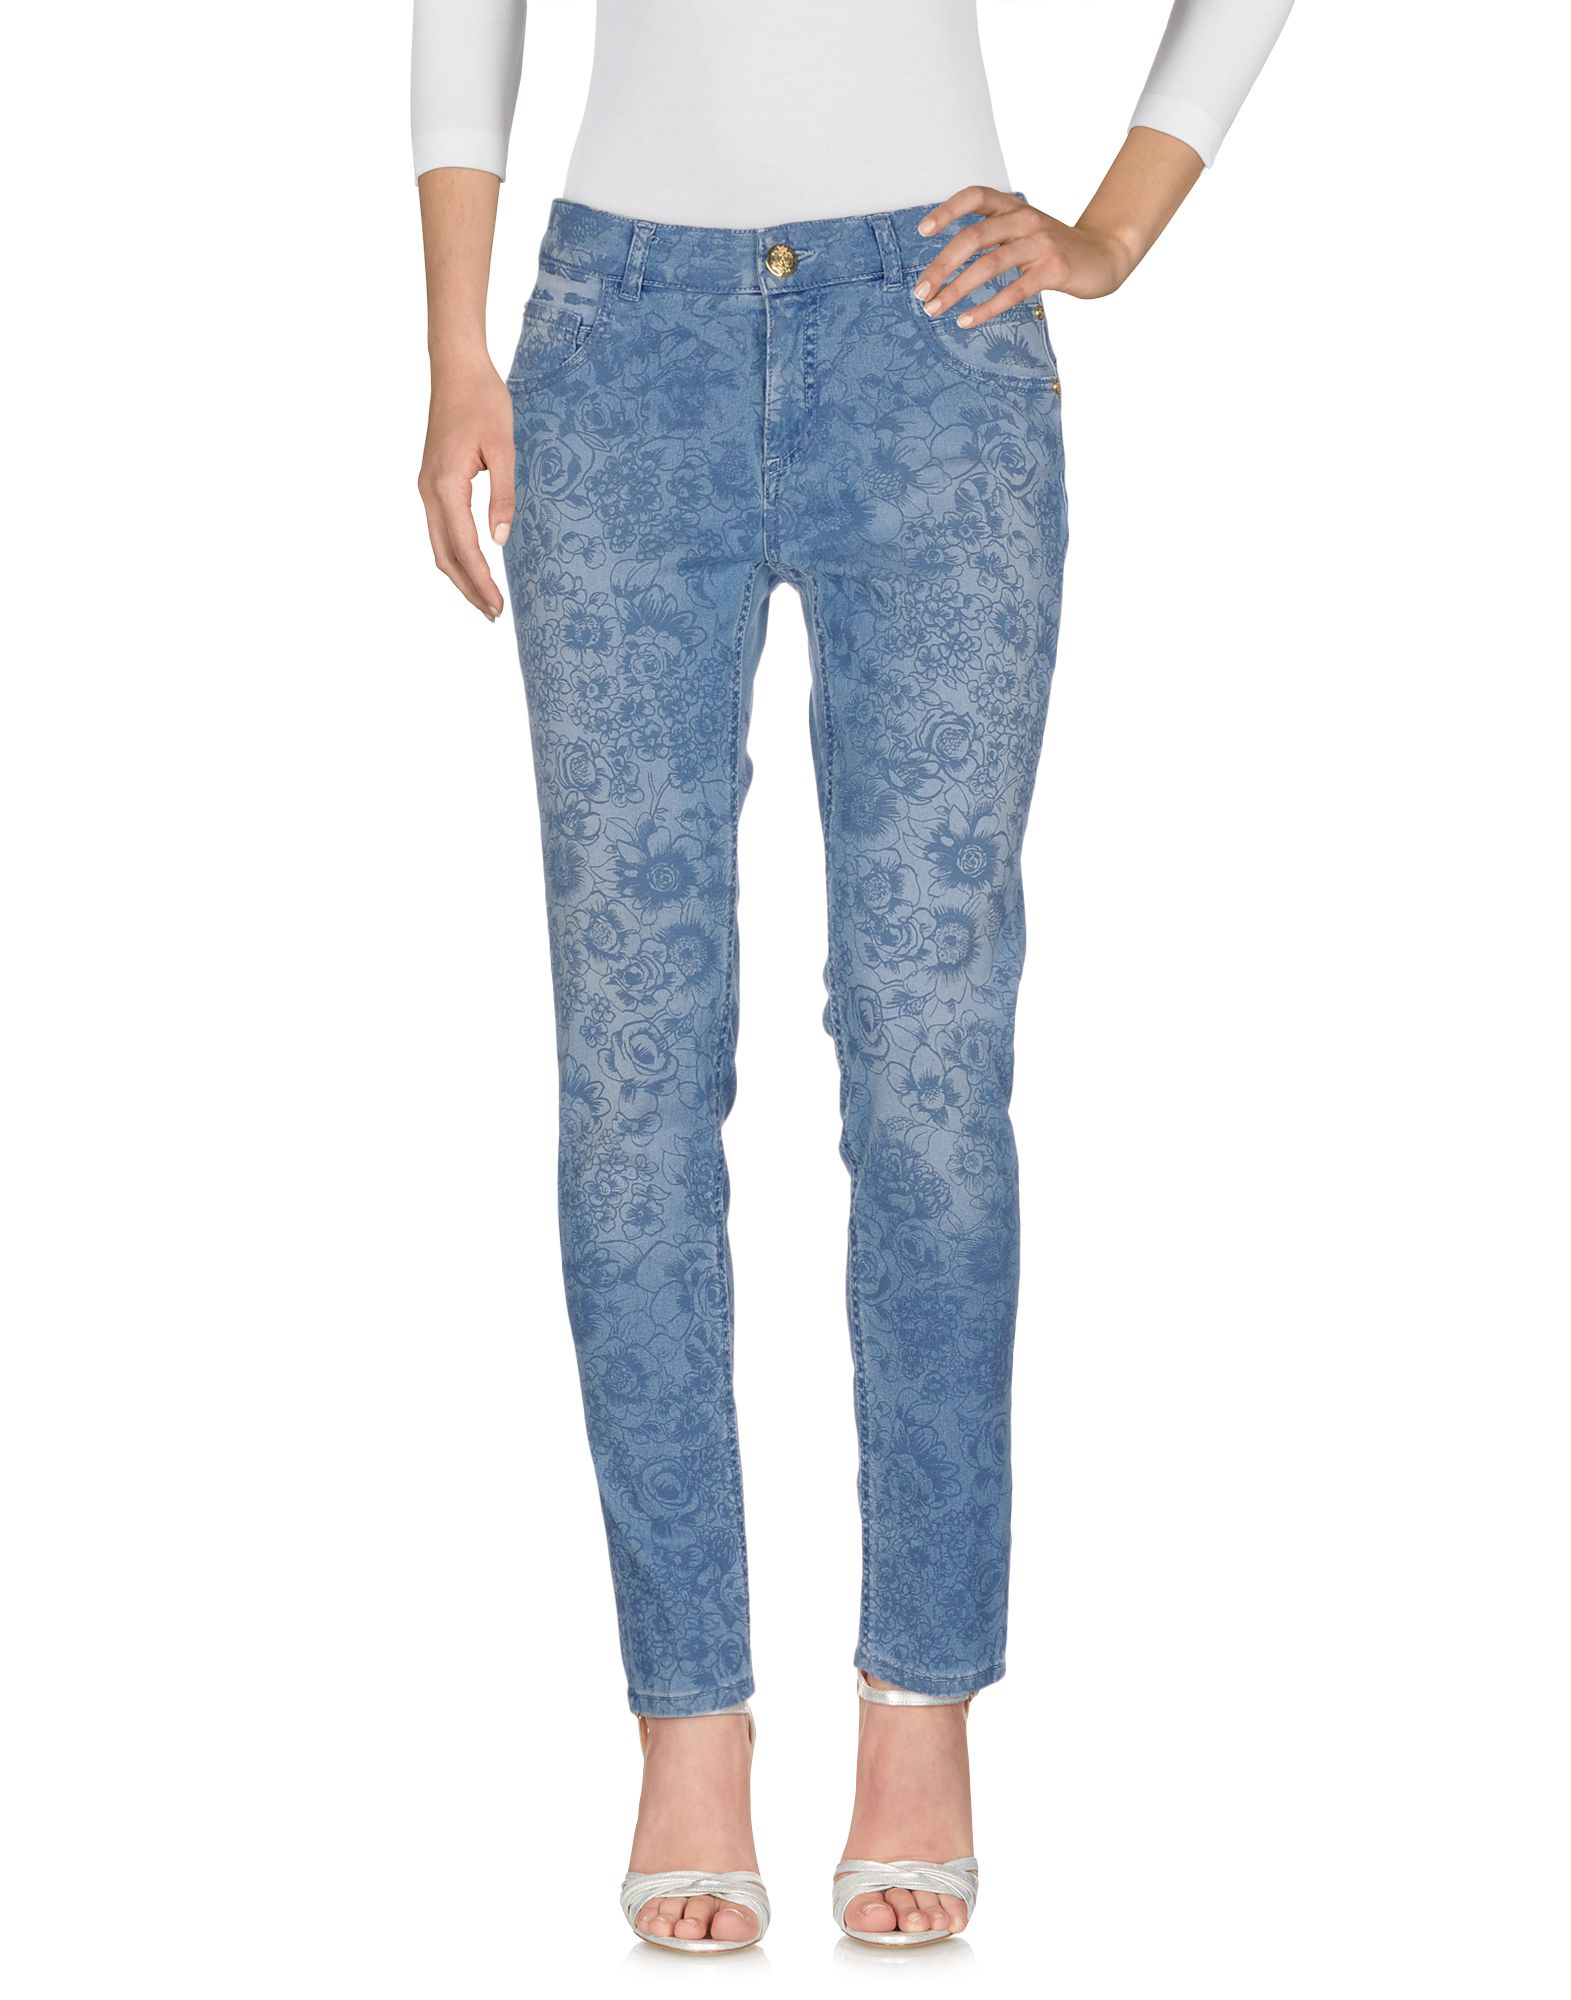 Pantaloni Jeans Marani Jeans Donna - Acquista online su xz1F3w2